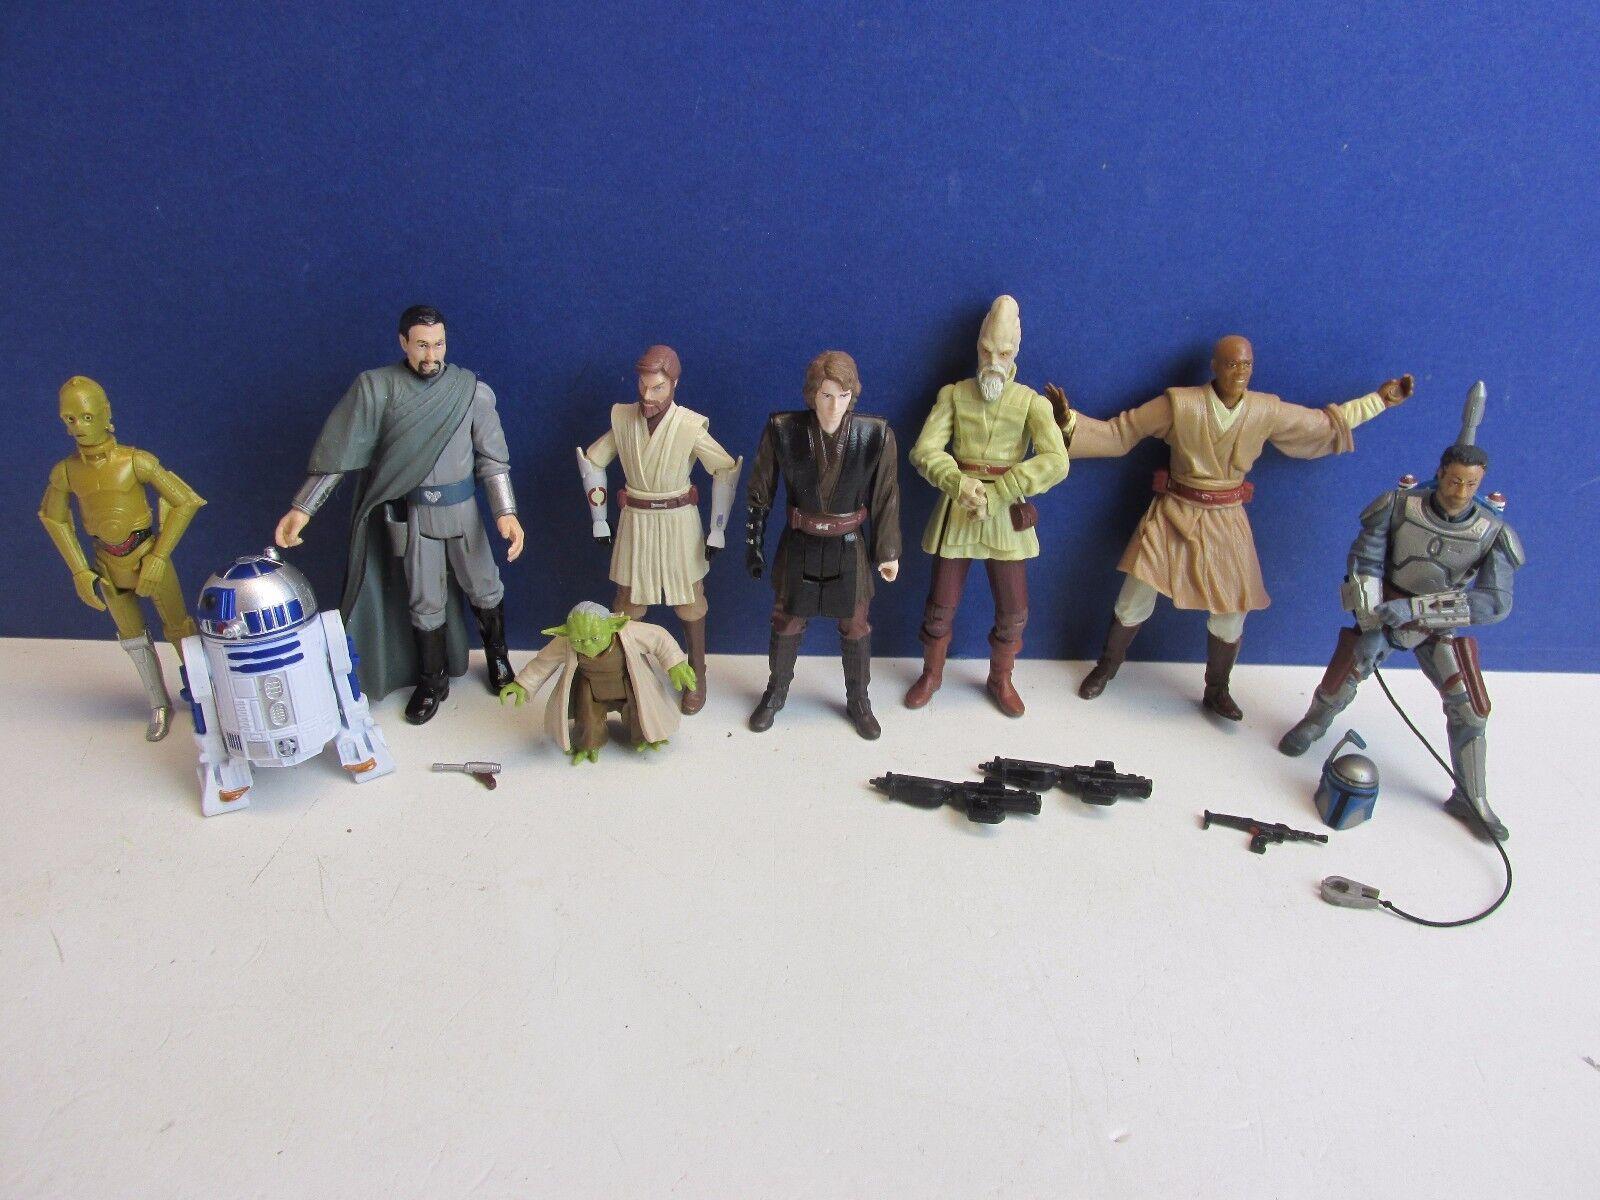 Star wars jedi - action - figur yoda windu organa jango fett anakin klonkriegen l